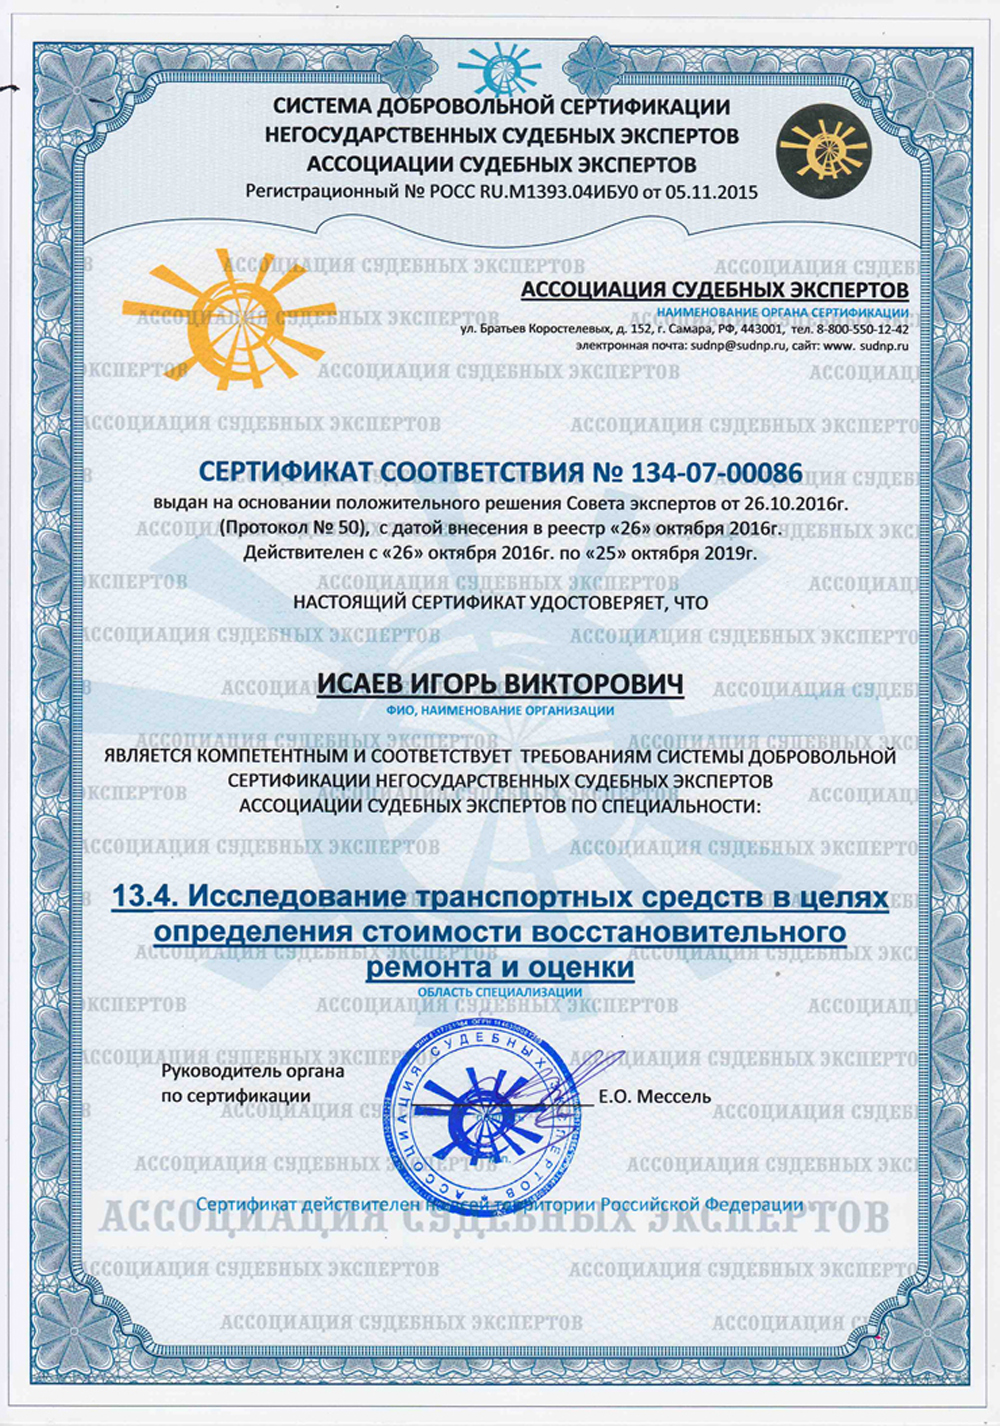 Сертификация ТС_Оценка_13_4 АСЭ